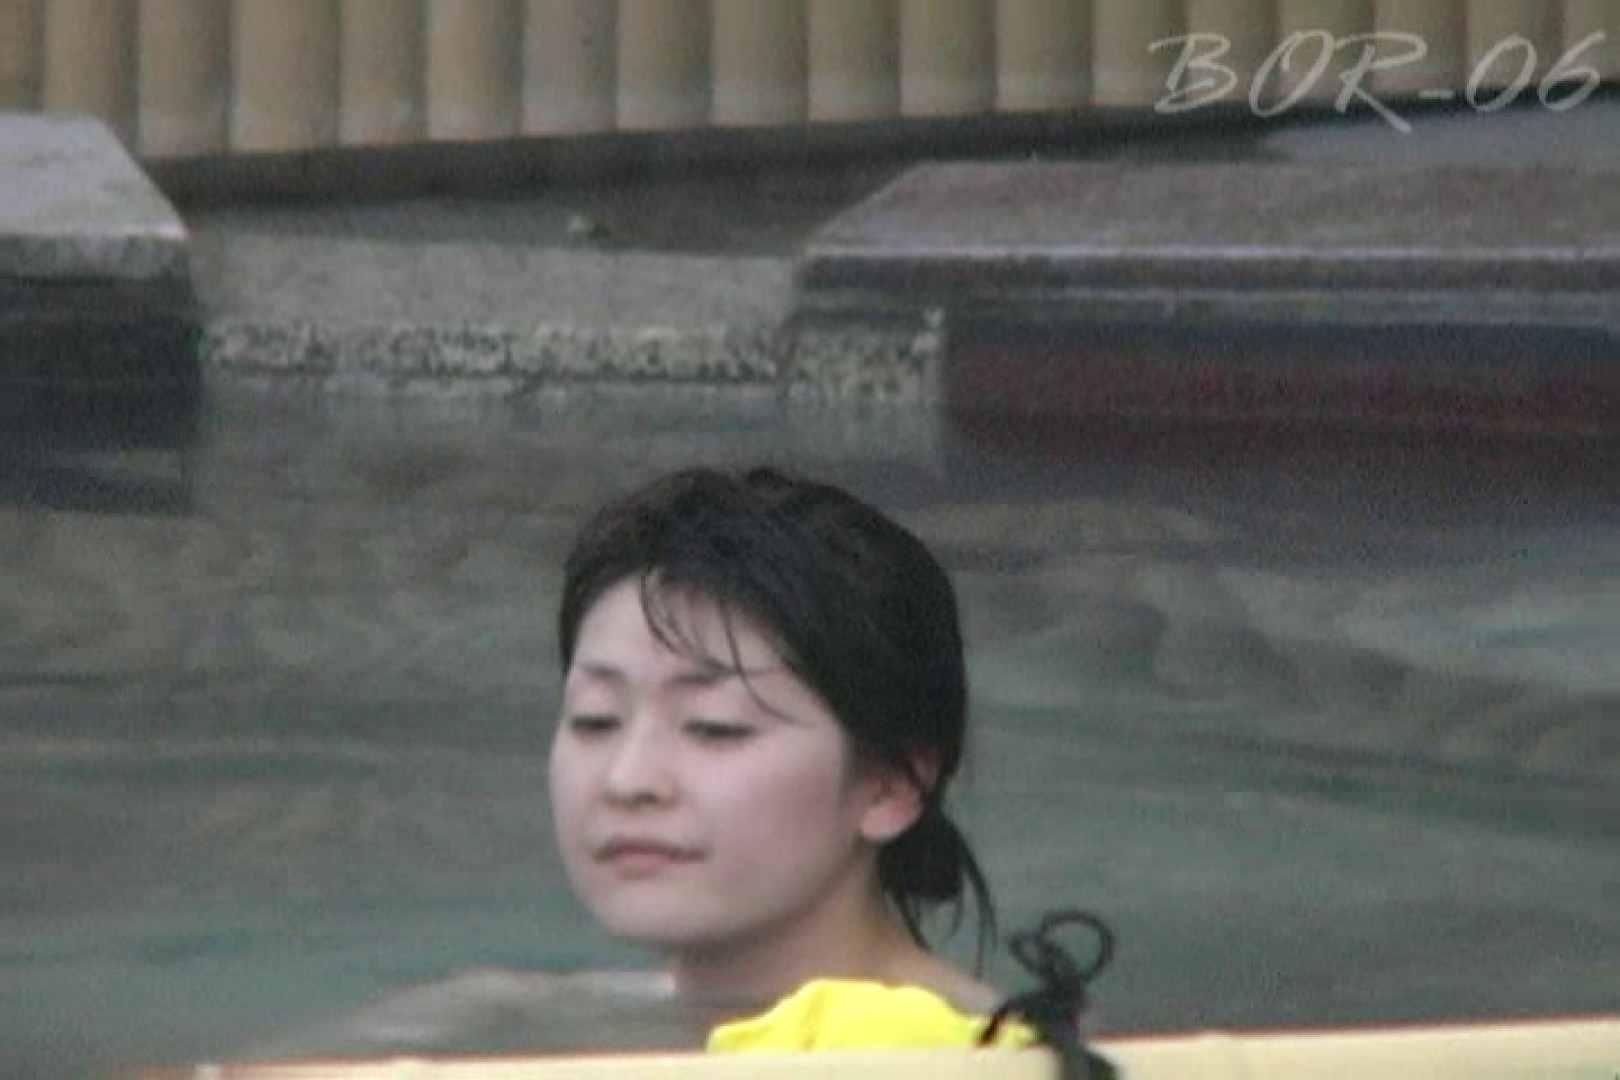 Aquaな露天風呂Vol.523 盗撮映像  93Pix 92